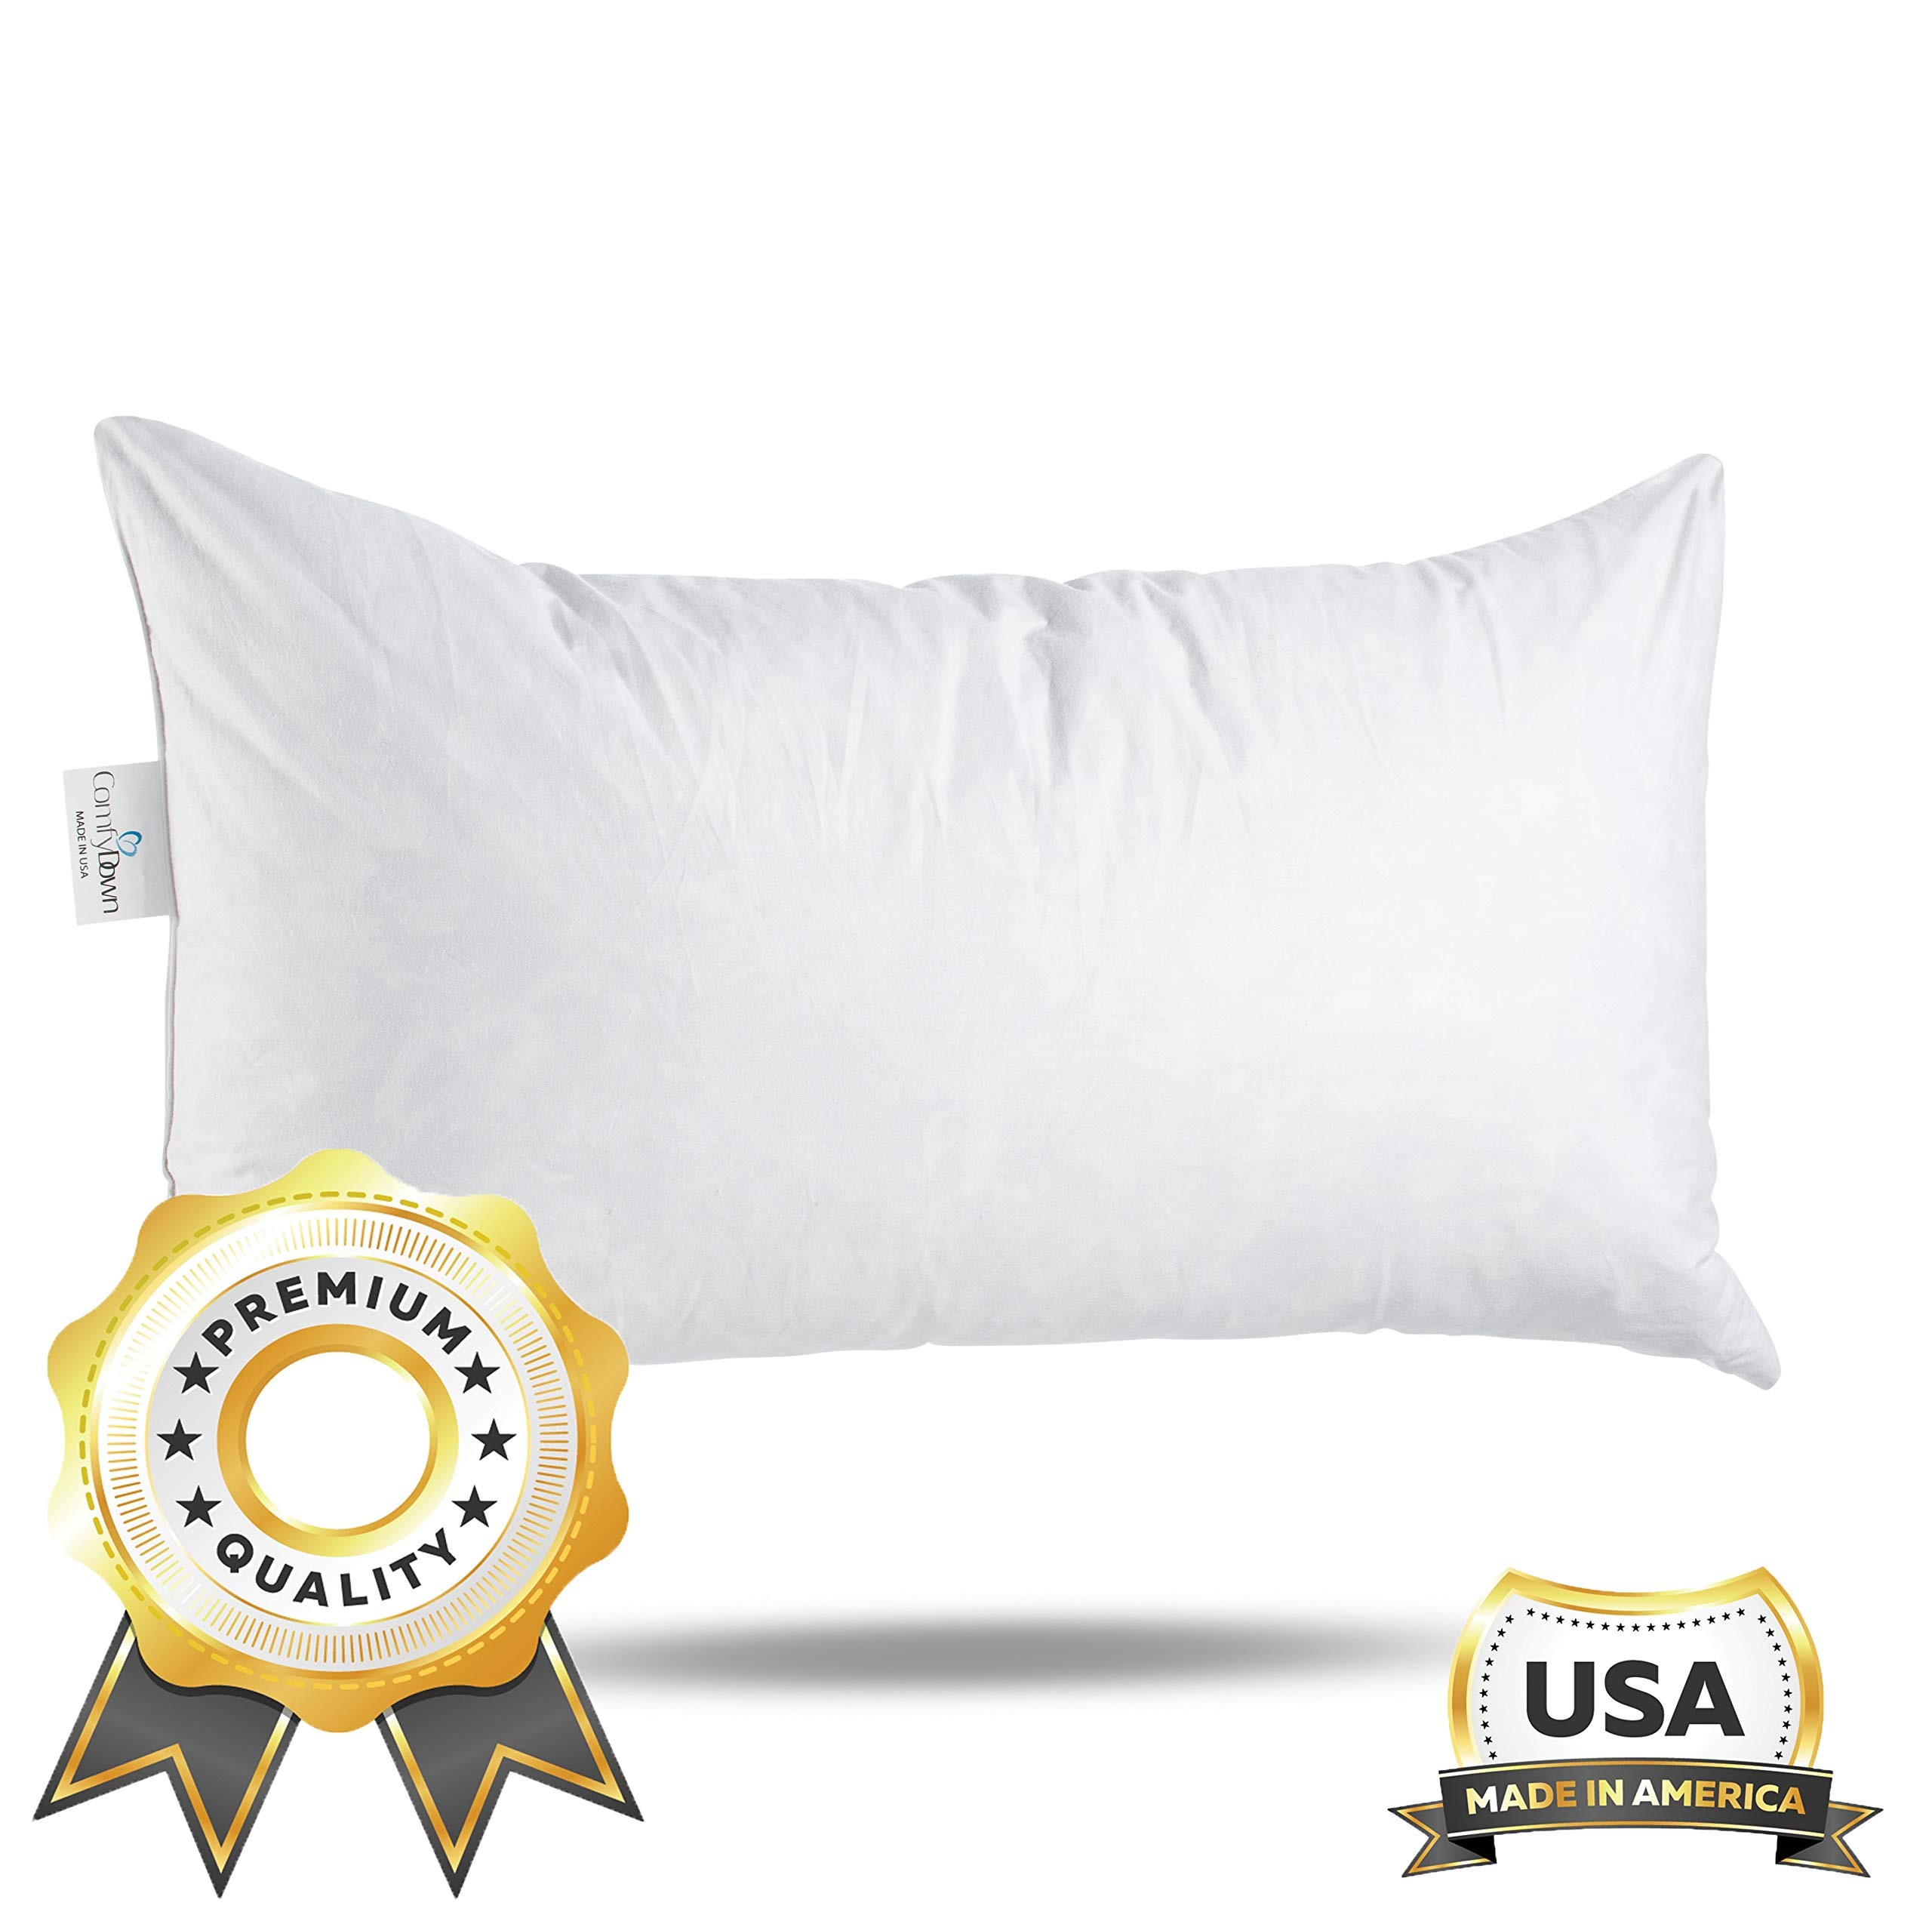 comfydown 95 feather 5 down 12 x 20 rectangle decorative pillow insert sham stuffer made in usa walmart com